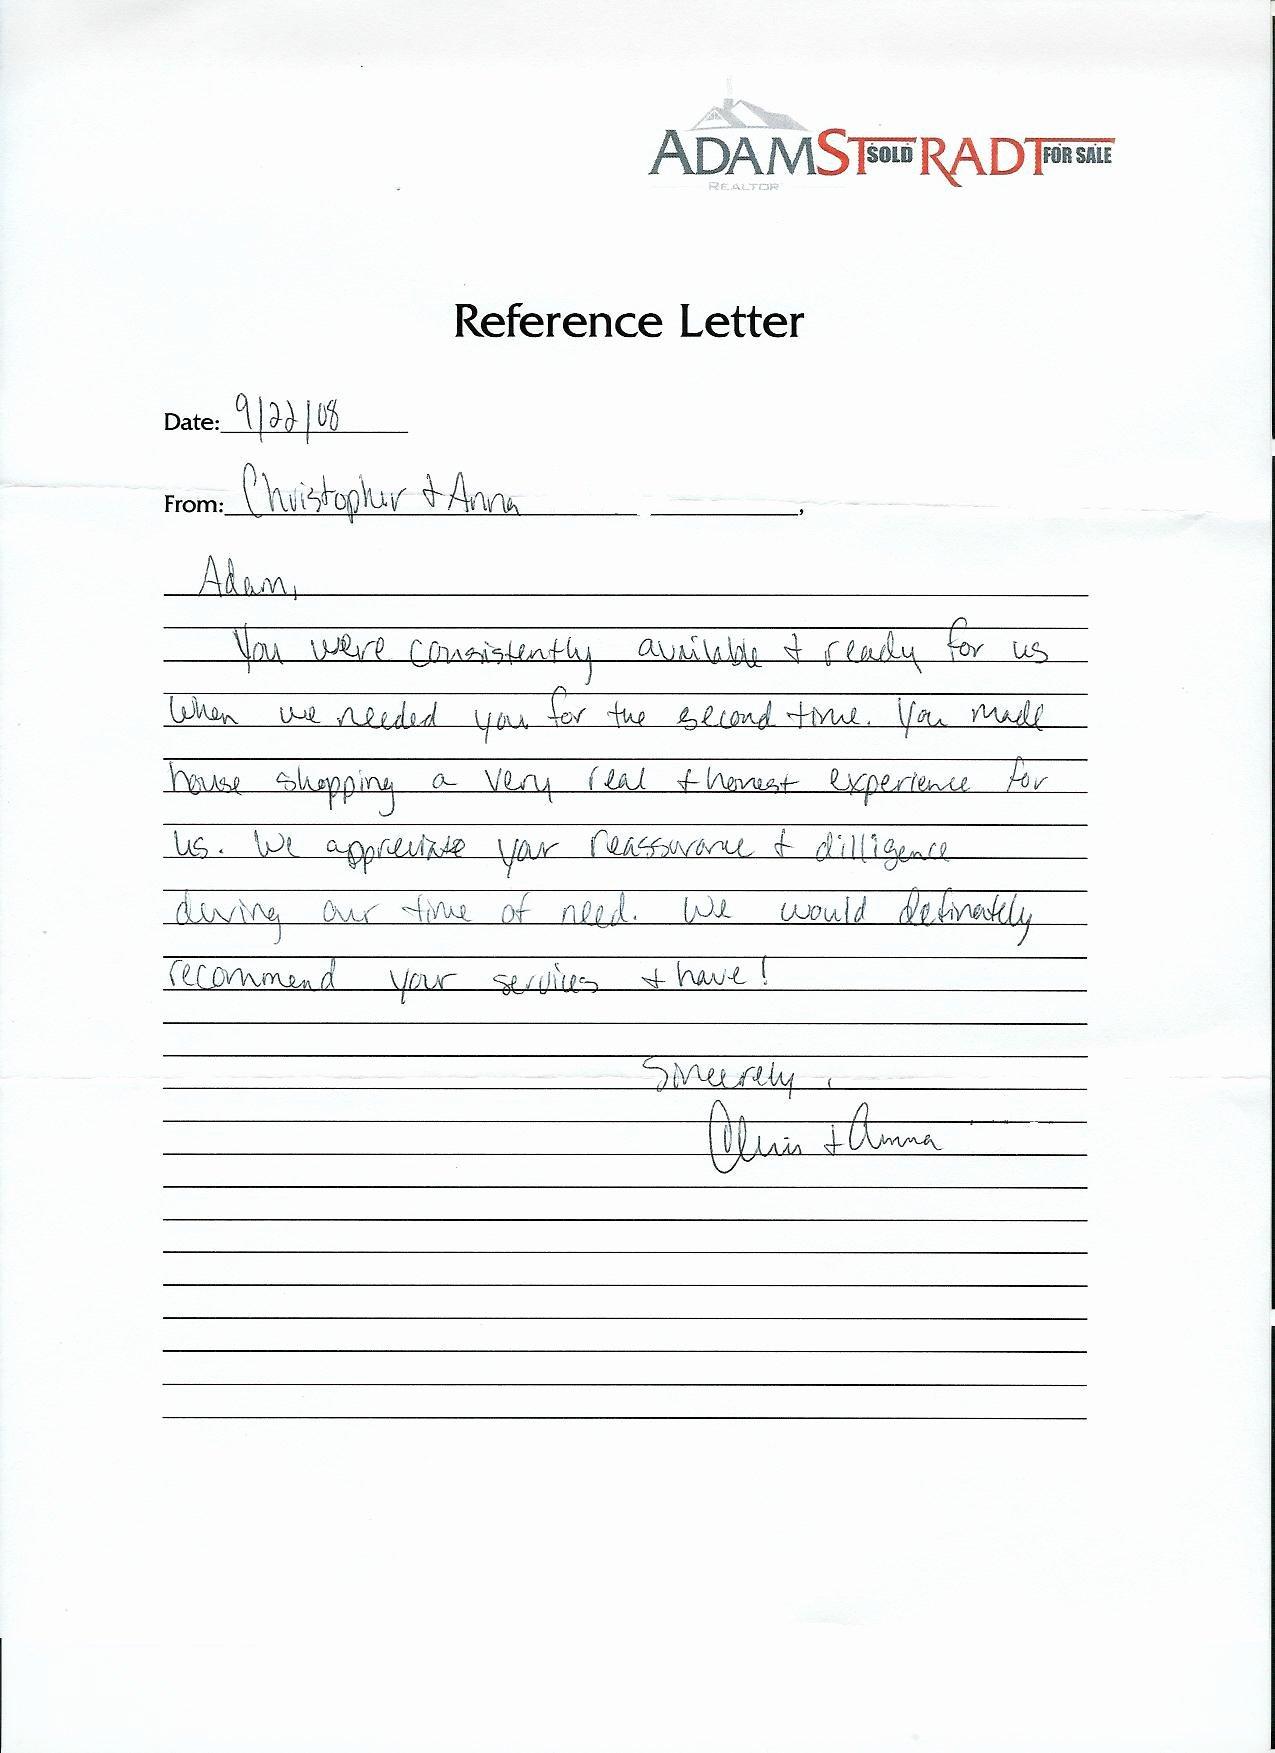 Realtor Recommendation Letter Examples Luxury Adam Stradt Realtor